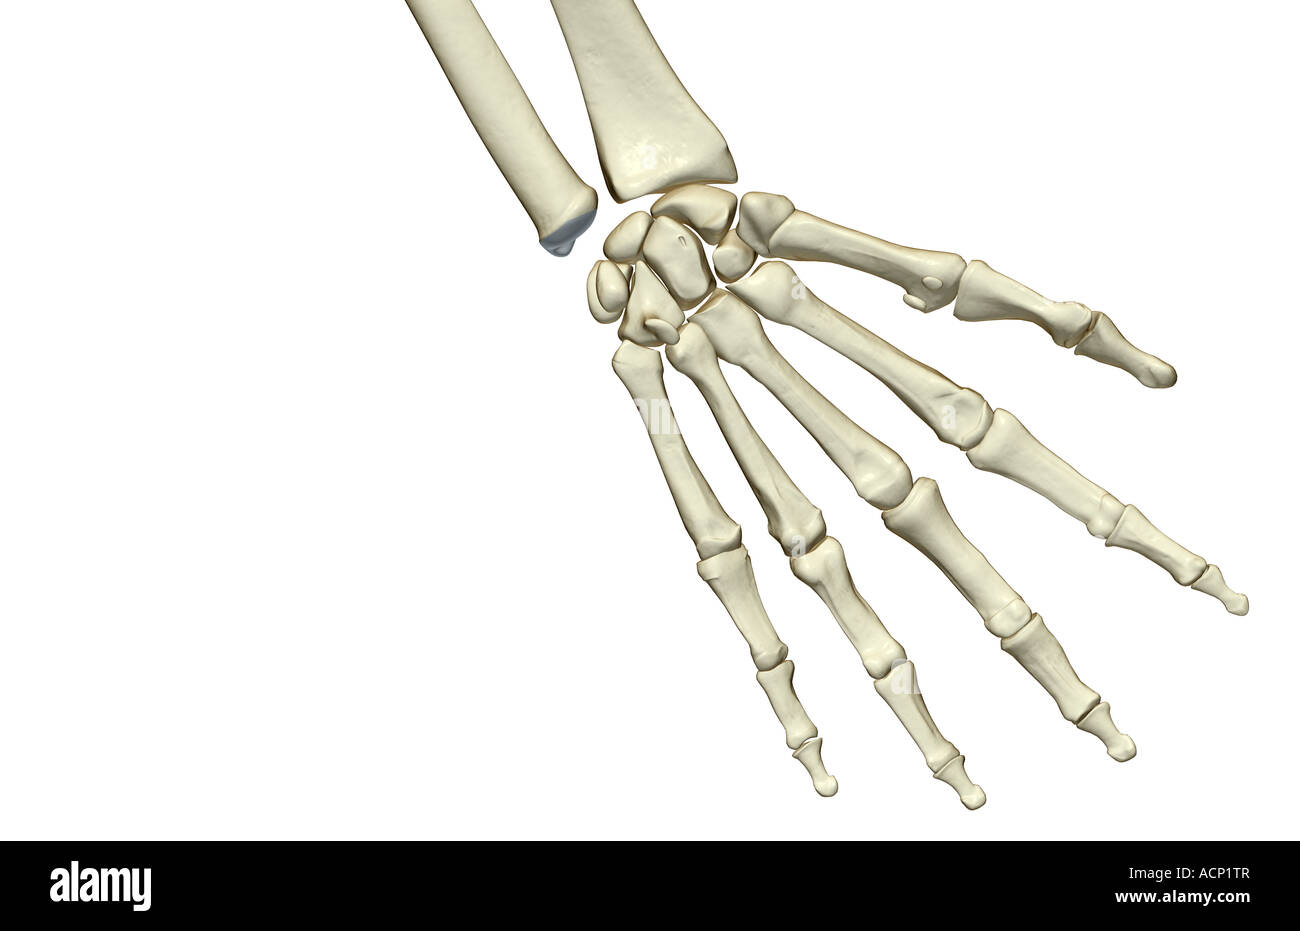 Charmant Carpals Knochen Galerie - Anatomie Ideen - finotti.info